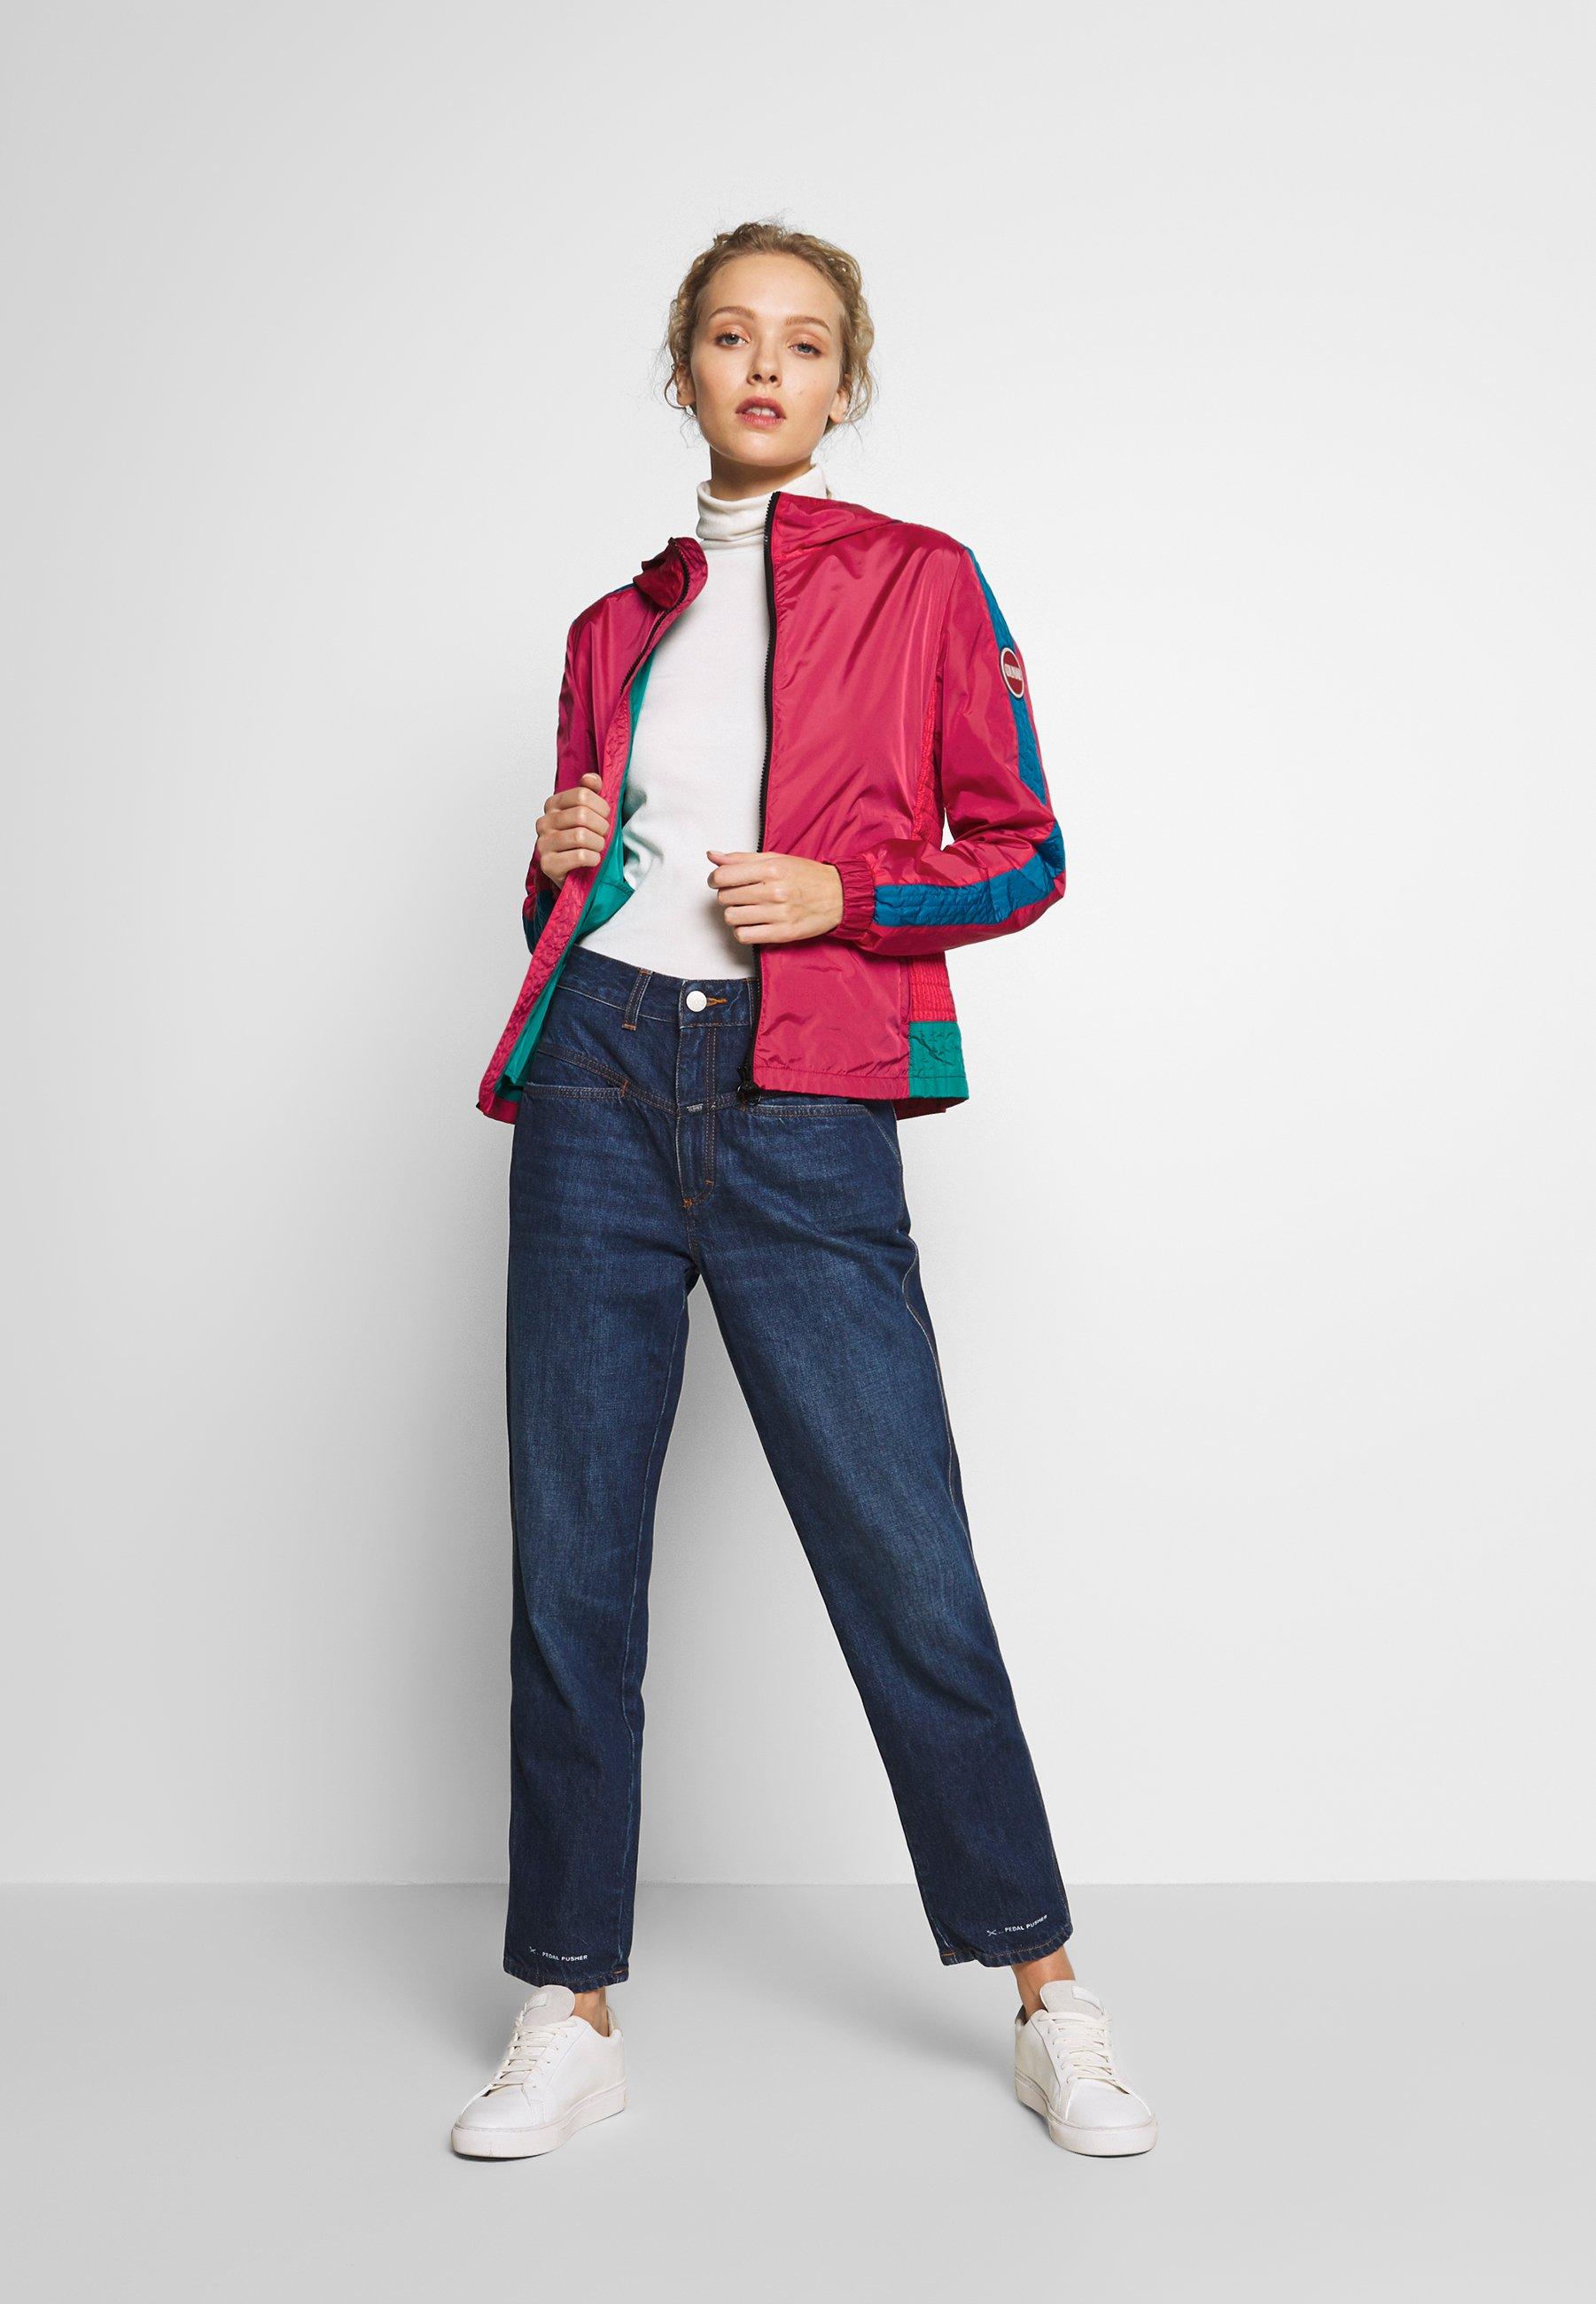 Colmar Originals Ladies Jacket - Kevyt Takki Raspberry/blue Fish